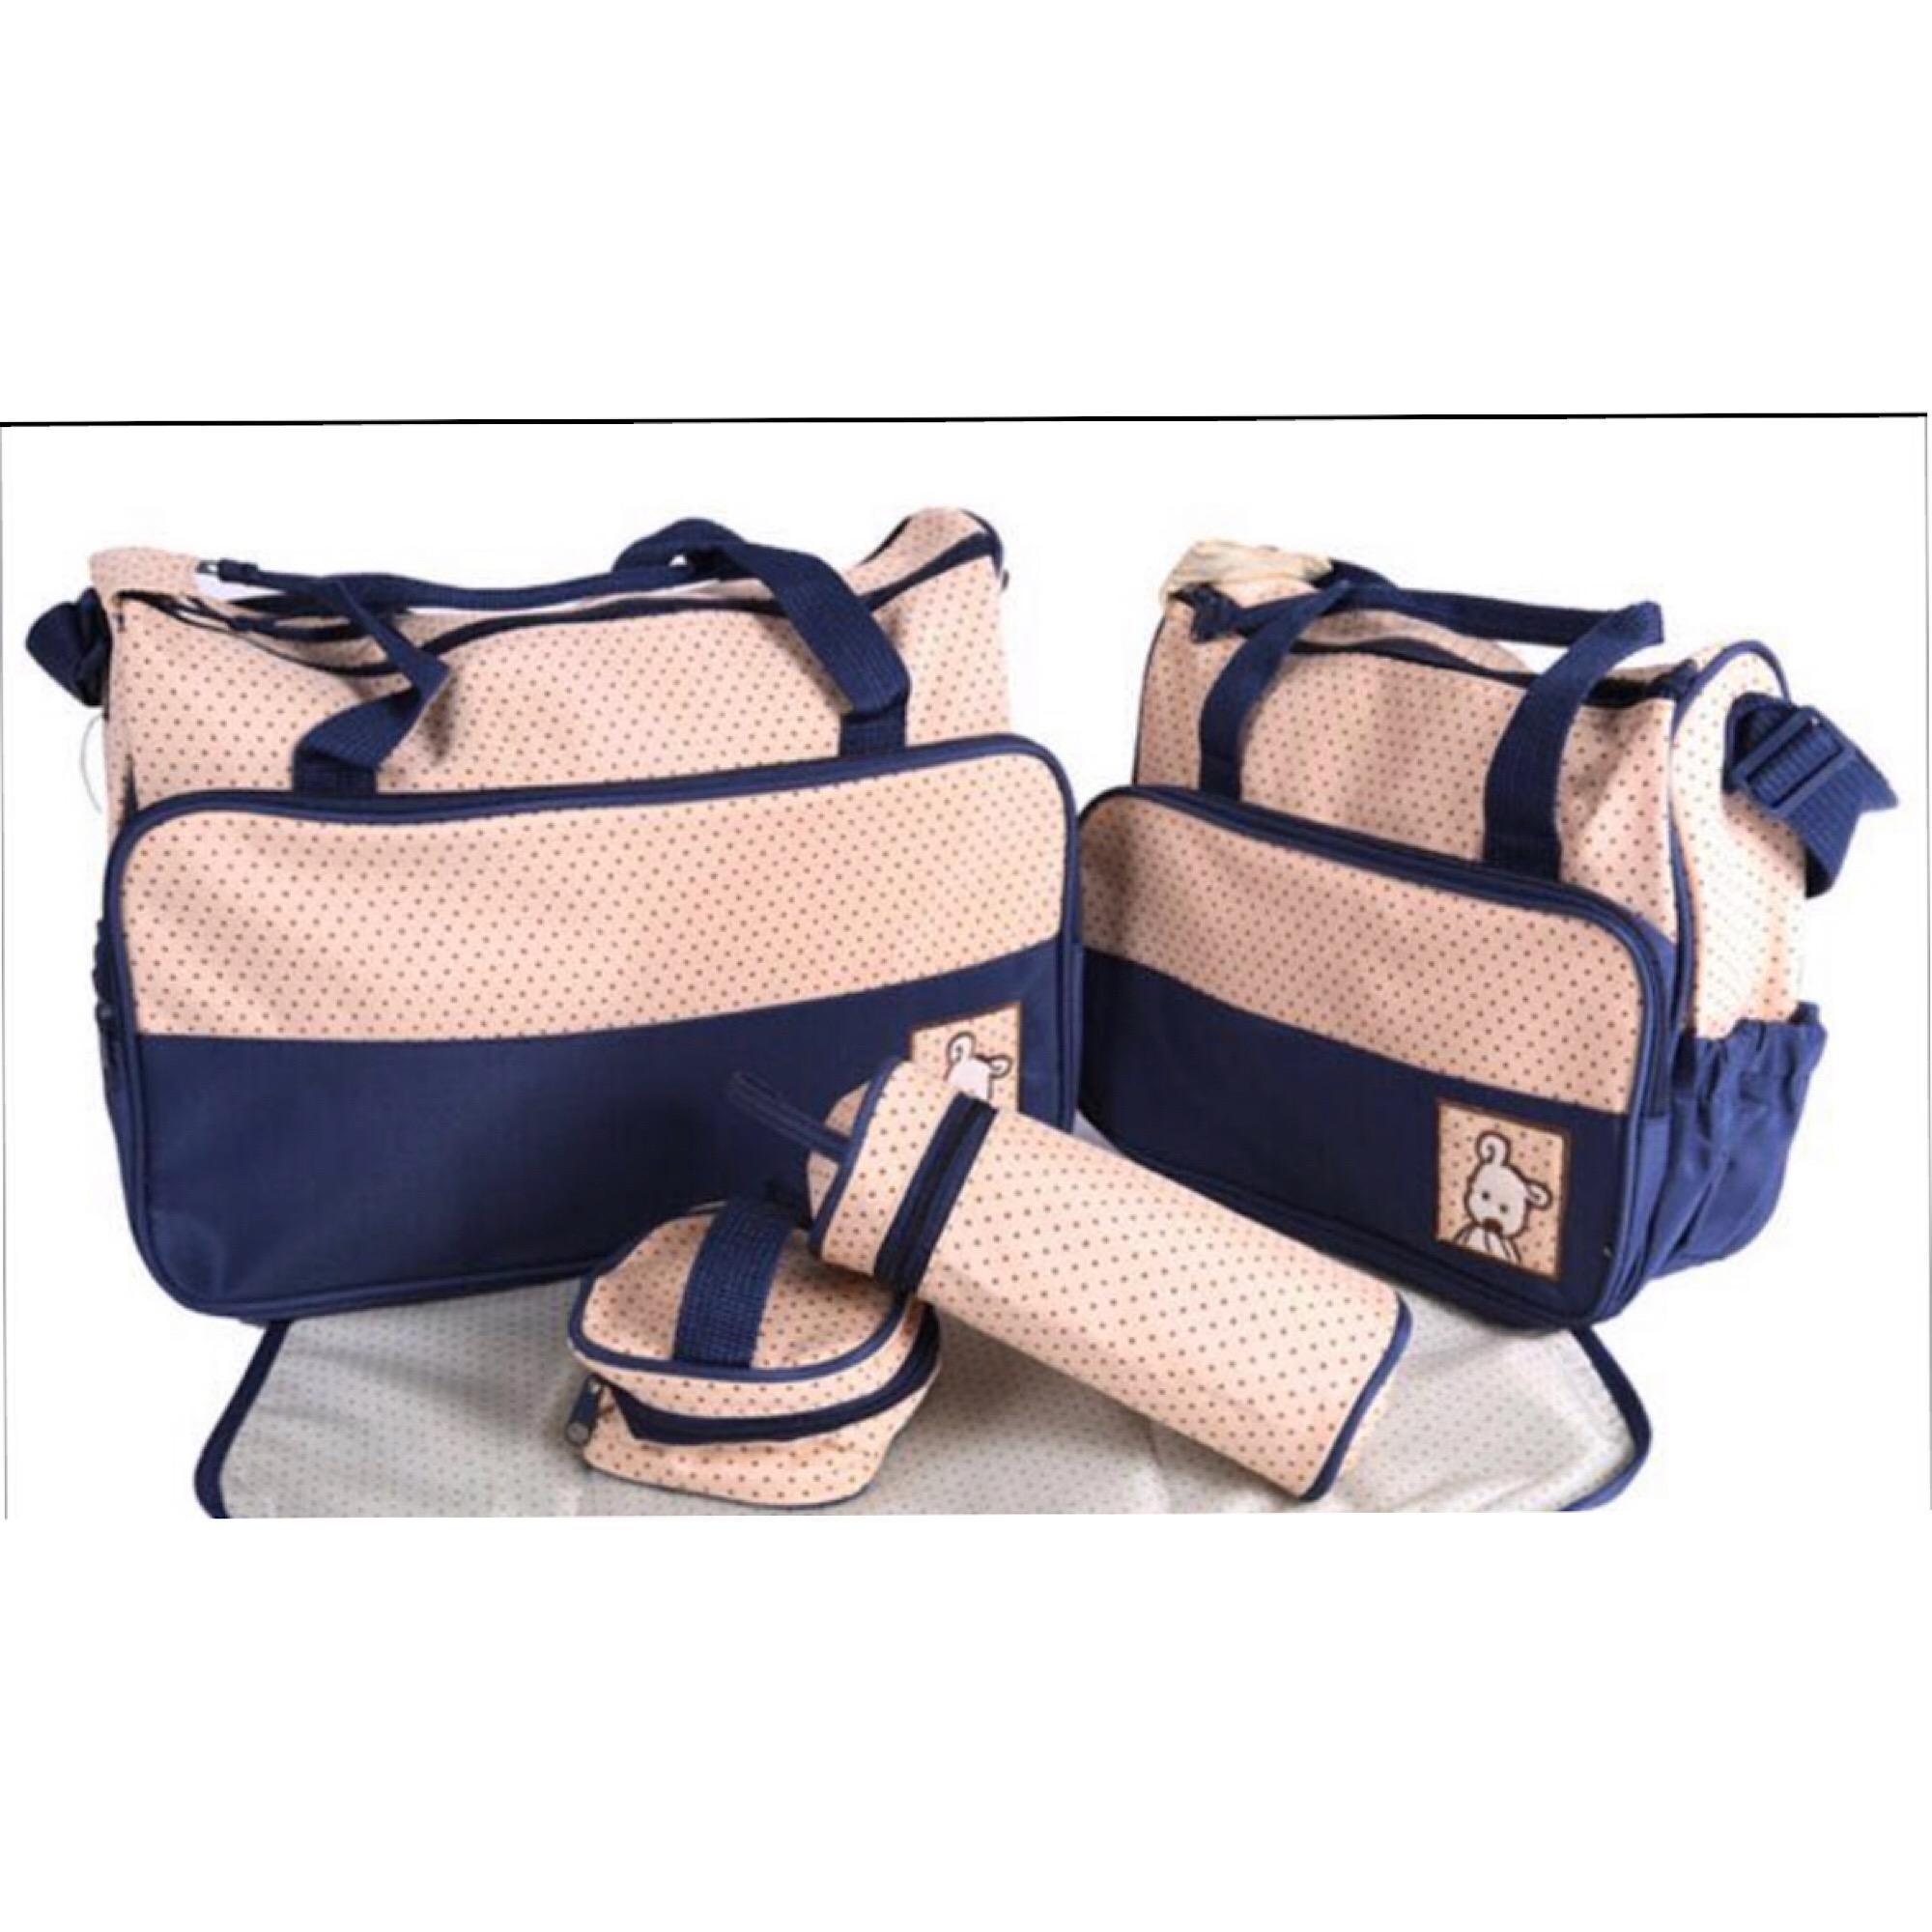 7430efb82018 Daiper Baby Bag Set (4 Pcs)